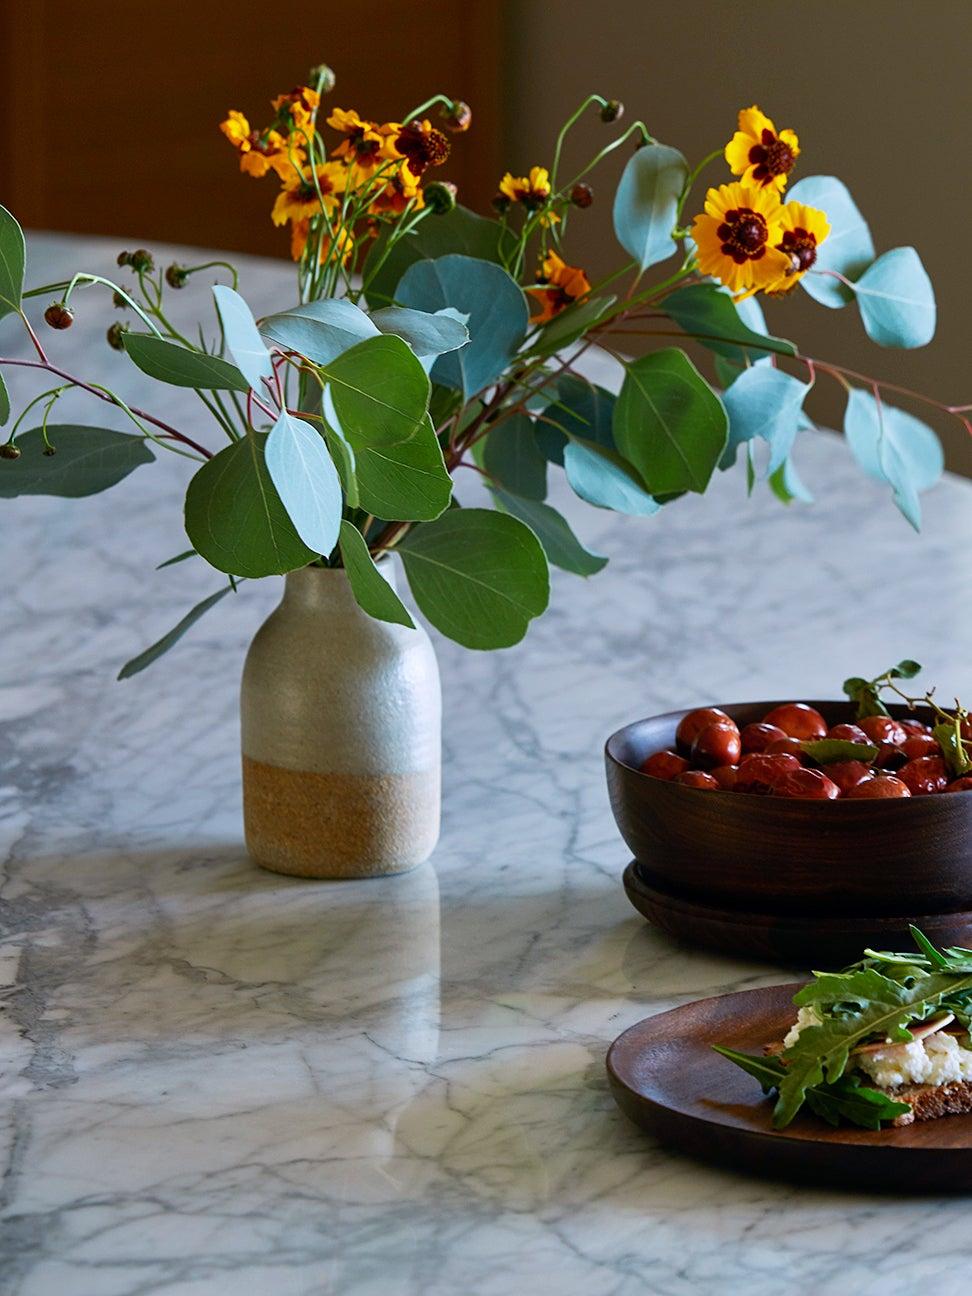 Finally, a Chic Alternative to Ceramic Tableware